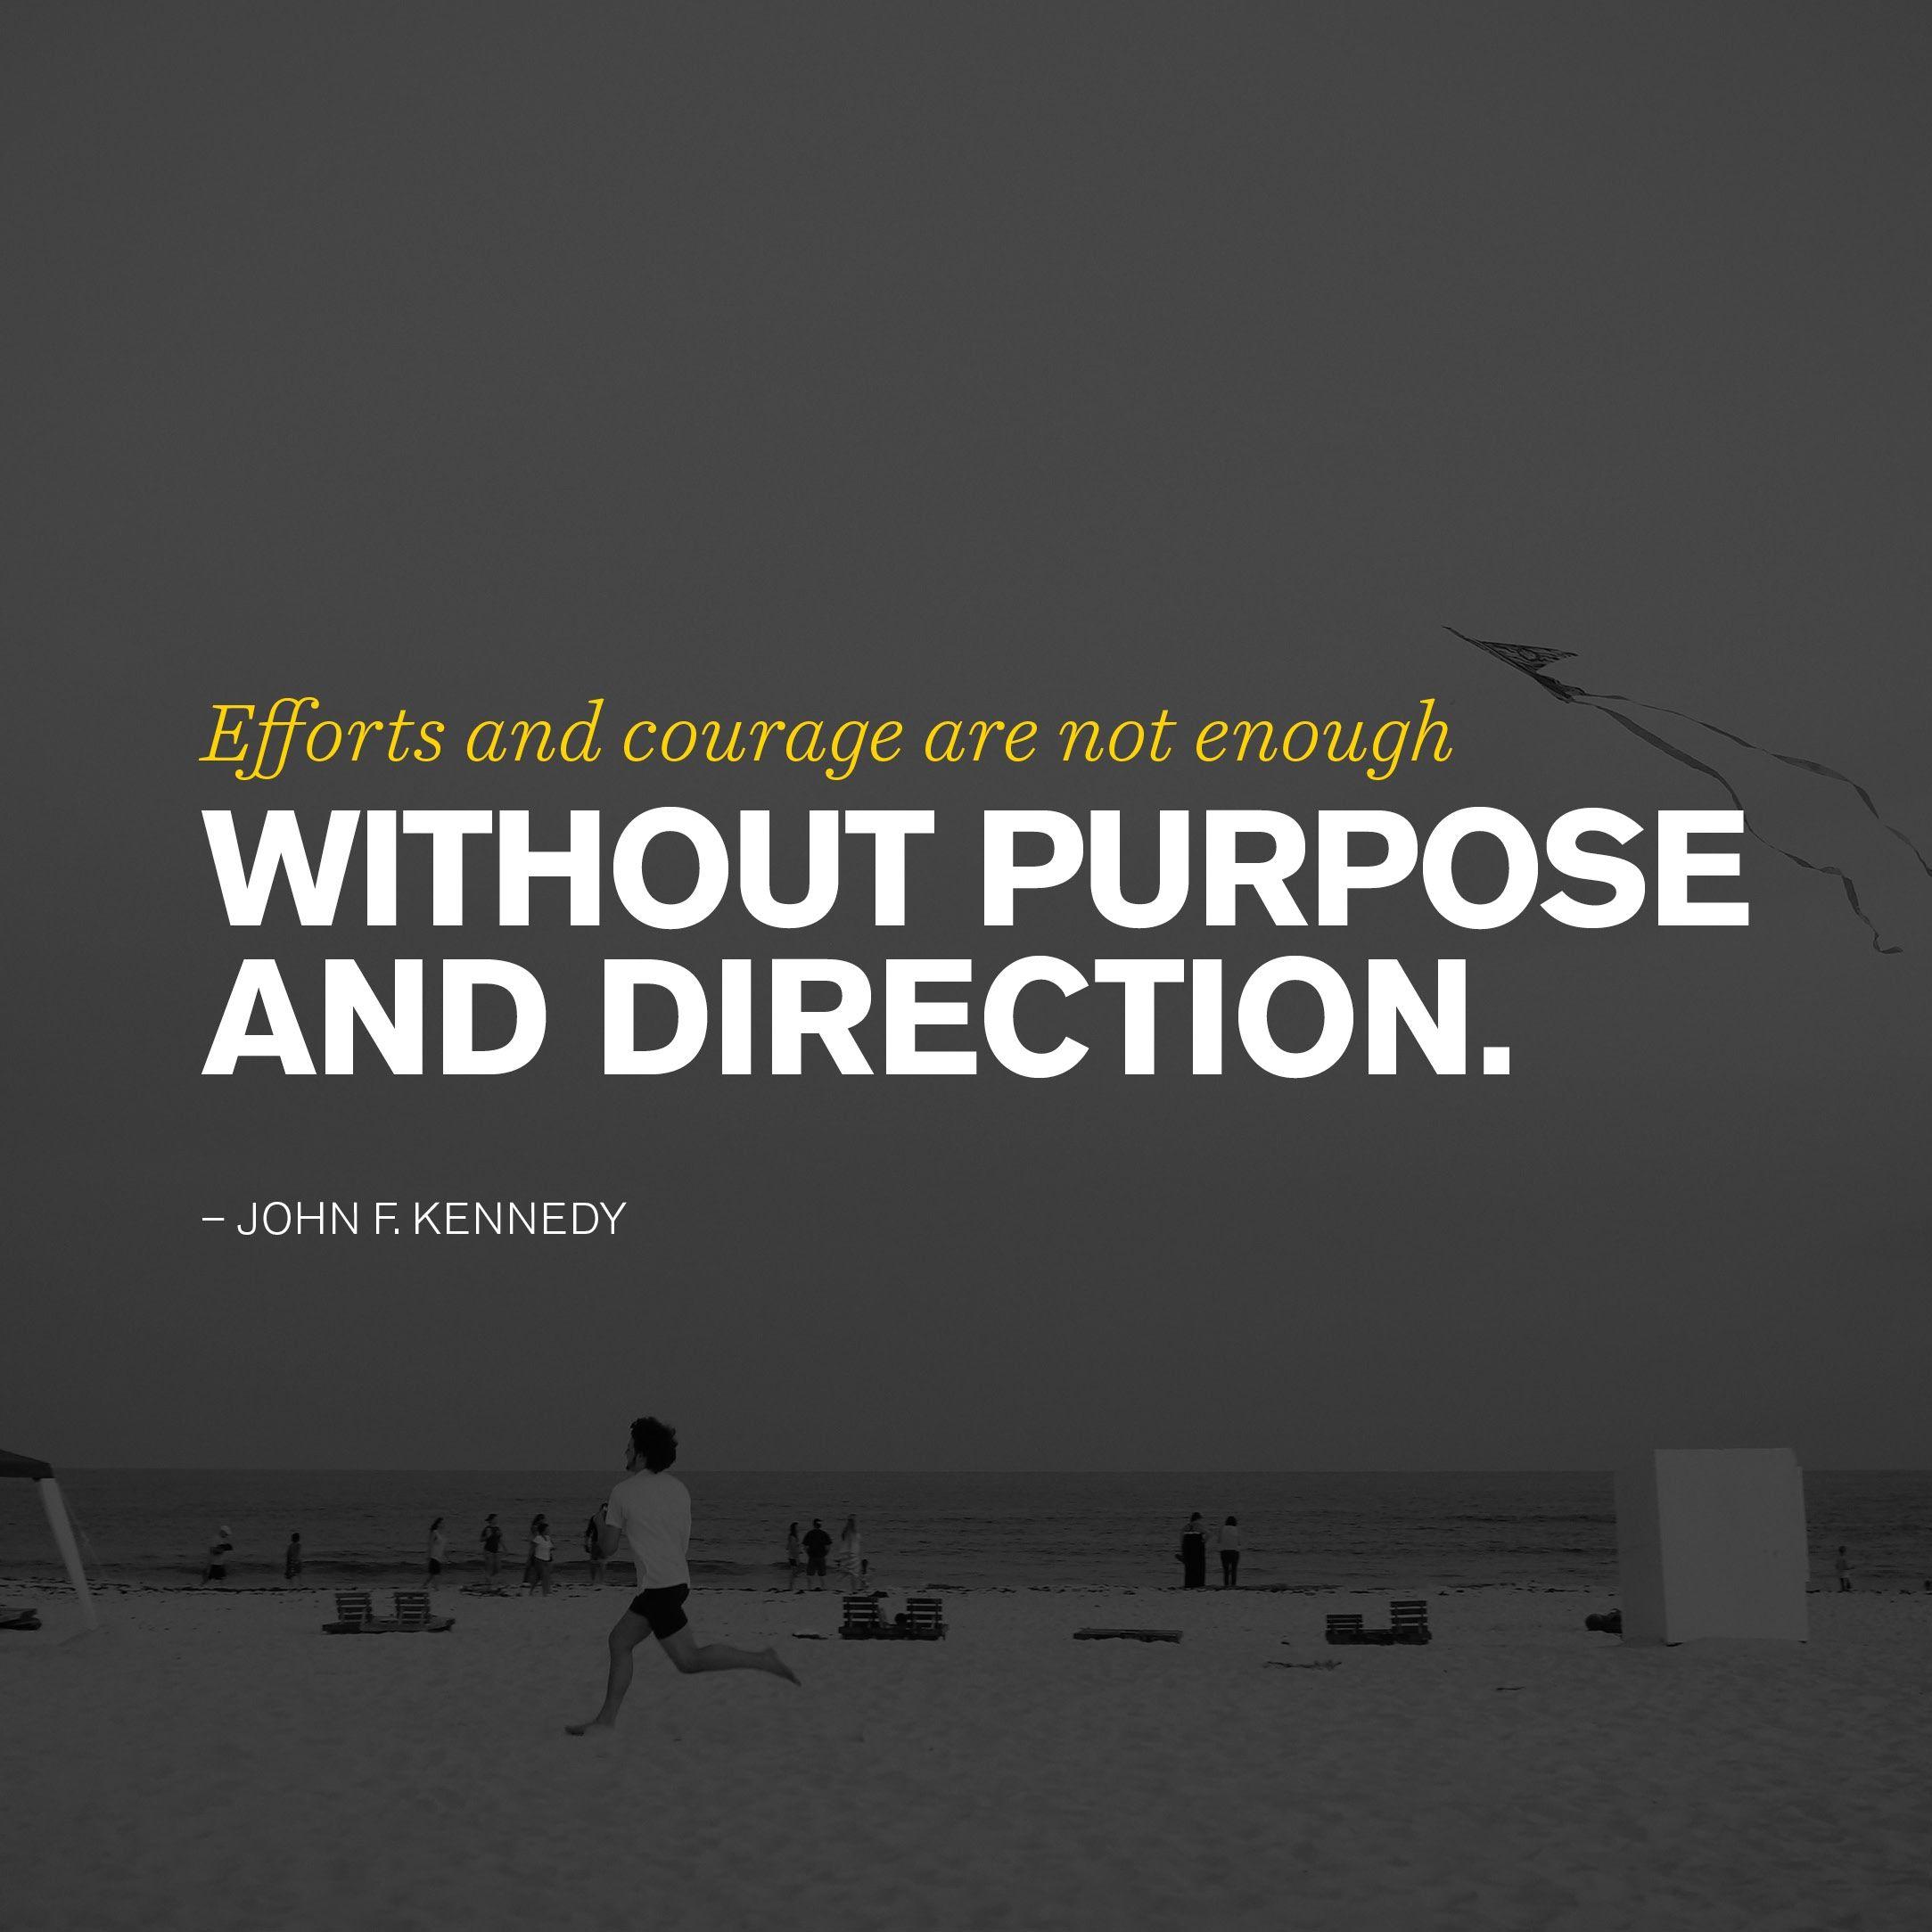 Purpose Quotes Bulldog Drummond  Uncommon Quotes To Drive Purpose  'purpose'ful